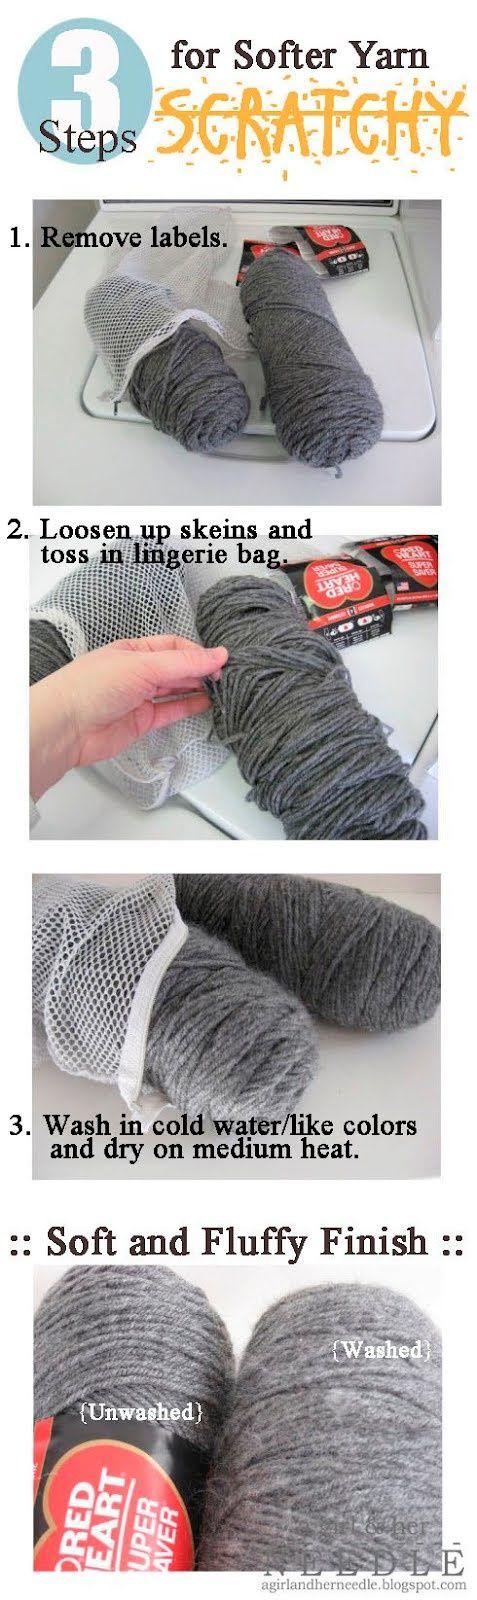 How to soften cheap acrylic yarns.